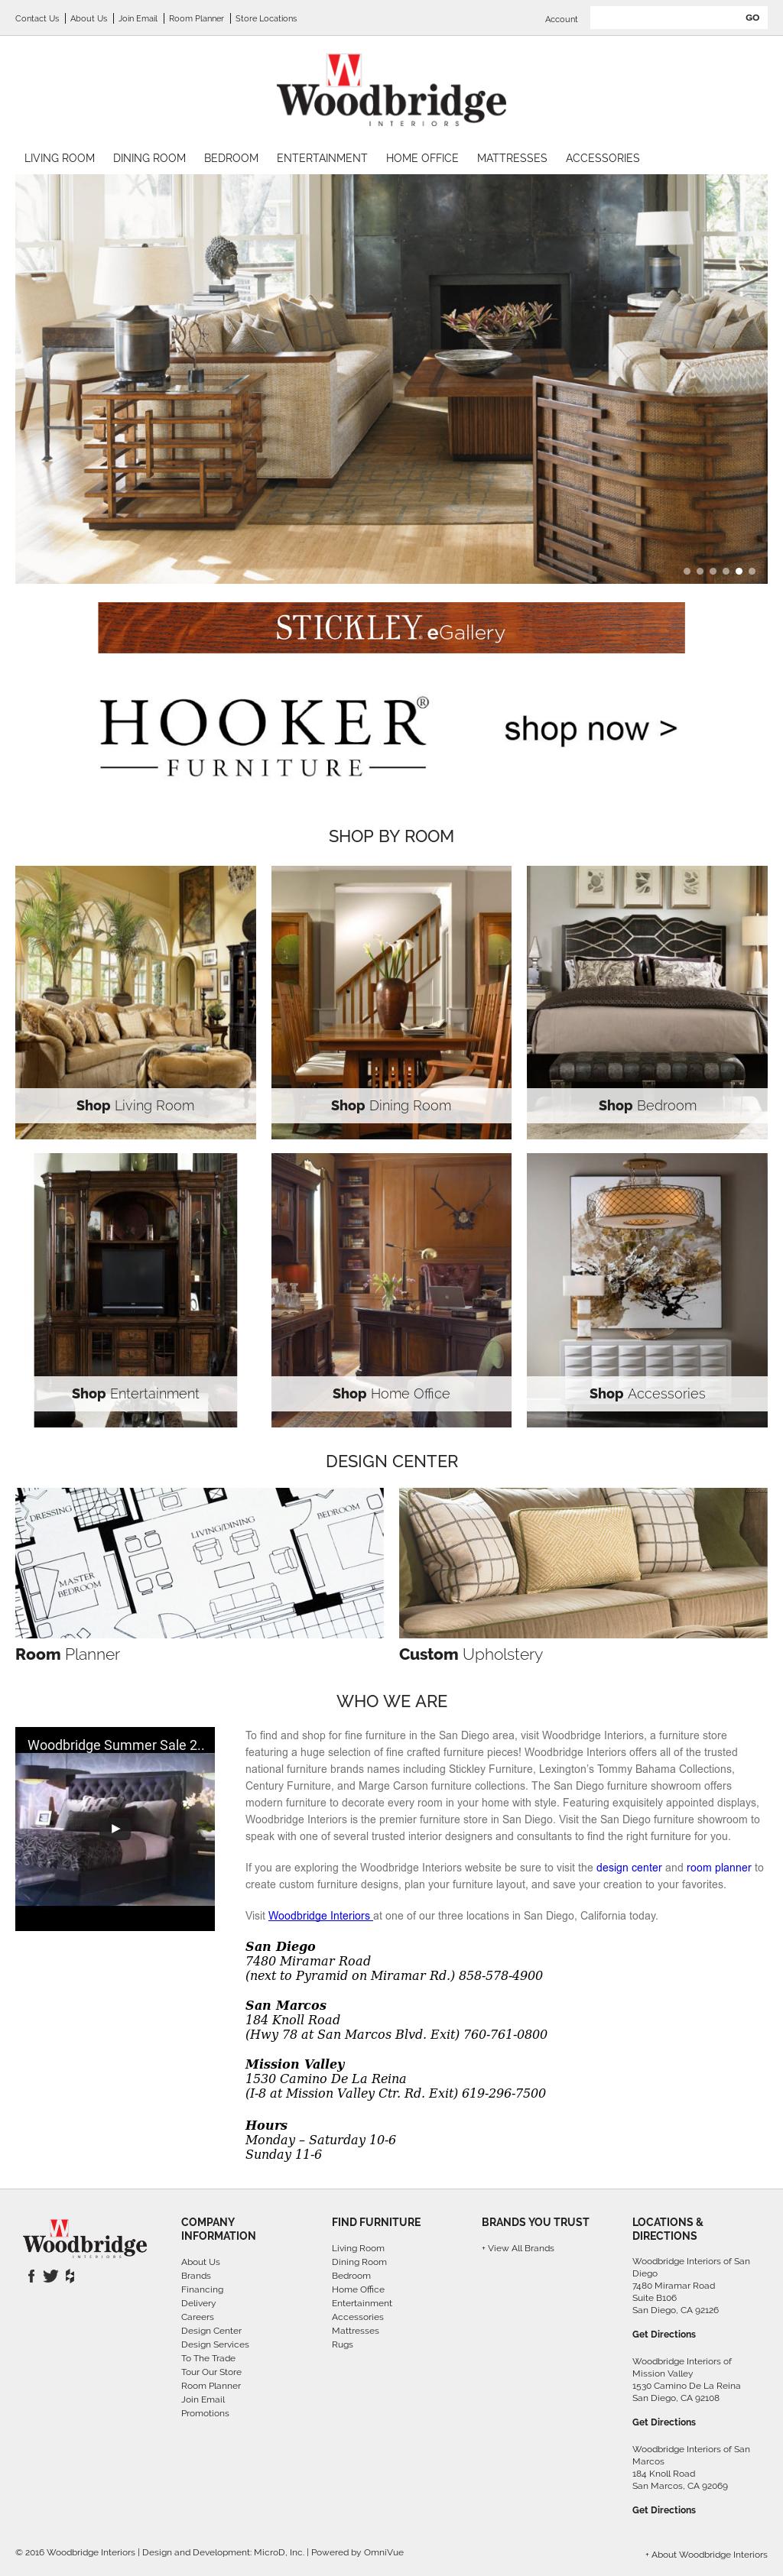 Woodbridge Interiors San Diego Competitors, Revenue And Employees   Owler  Company Profile